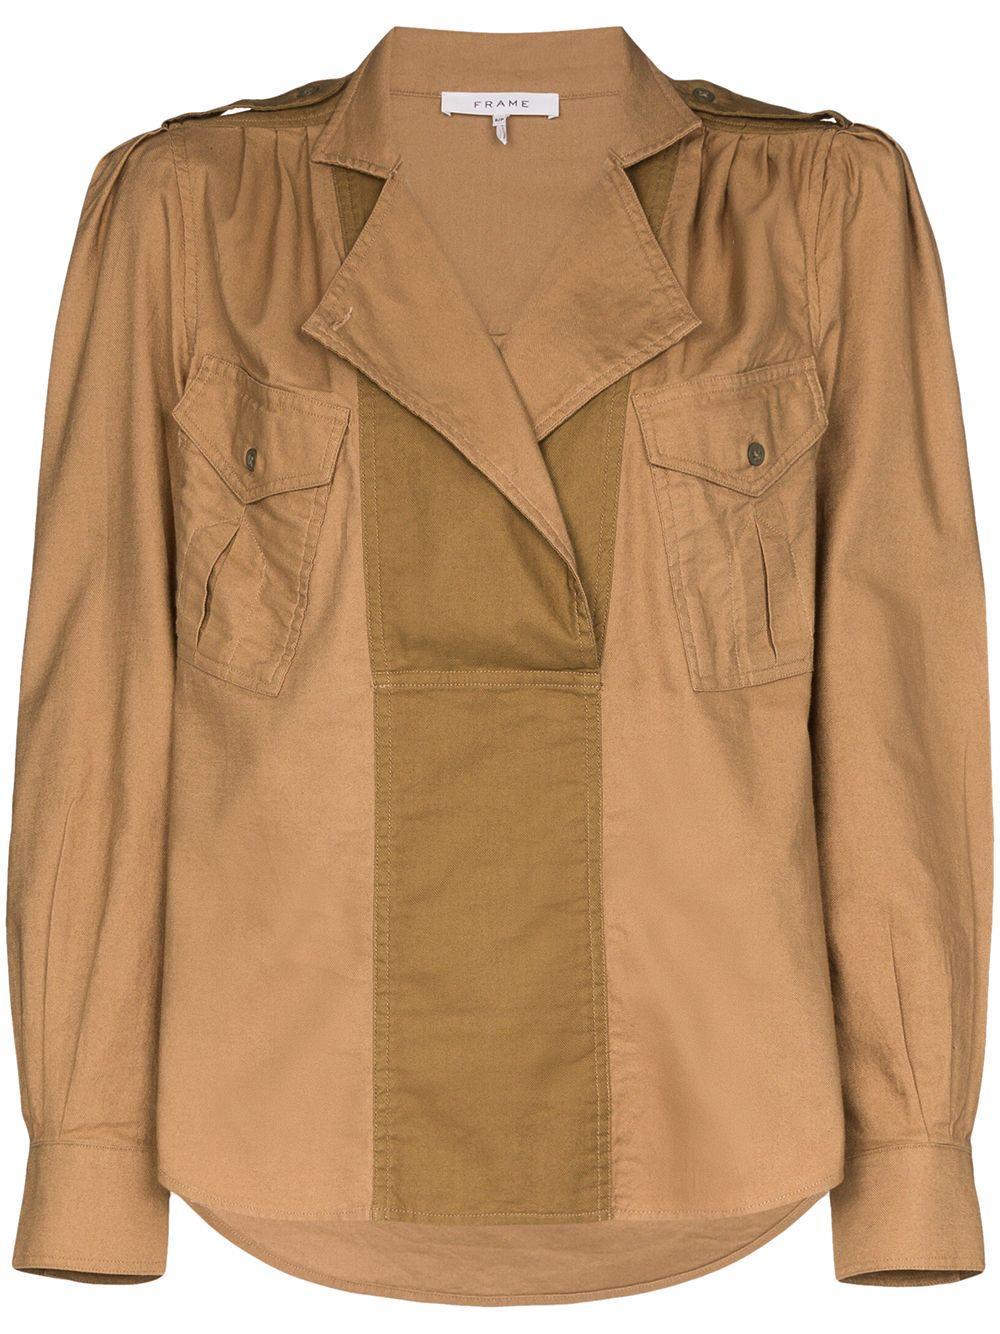 Safari Pocket Long Sleeve Top Item # LWSH1549